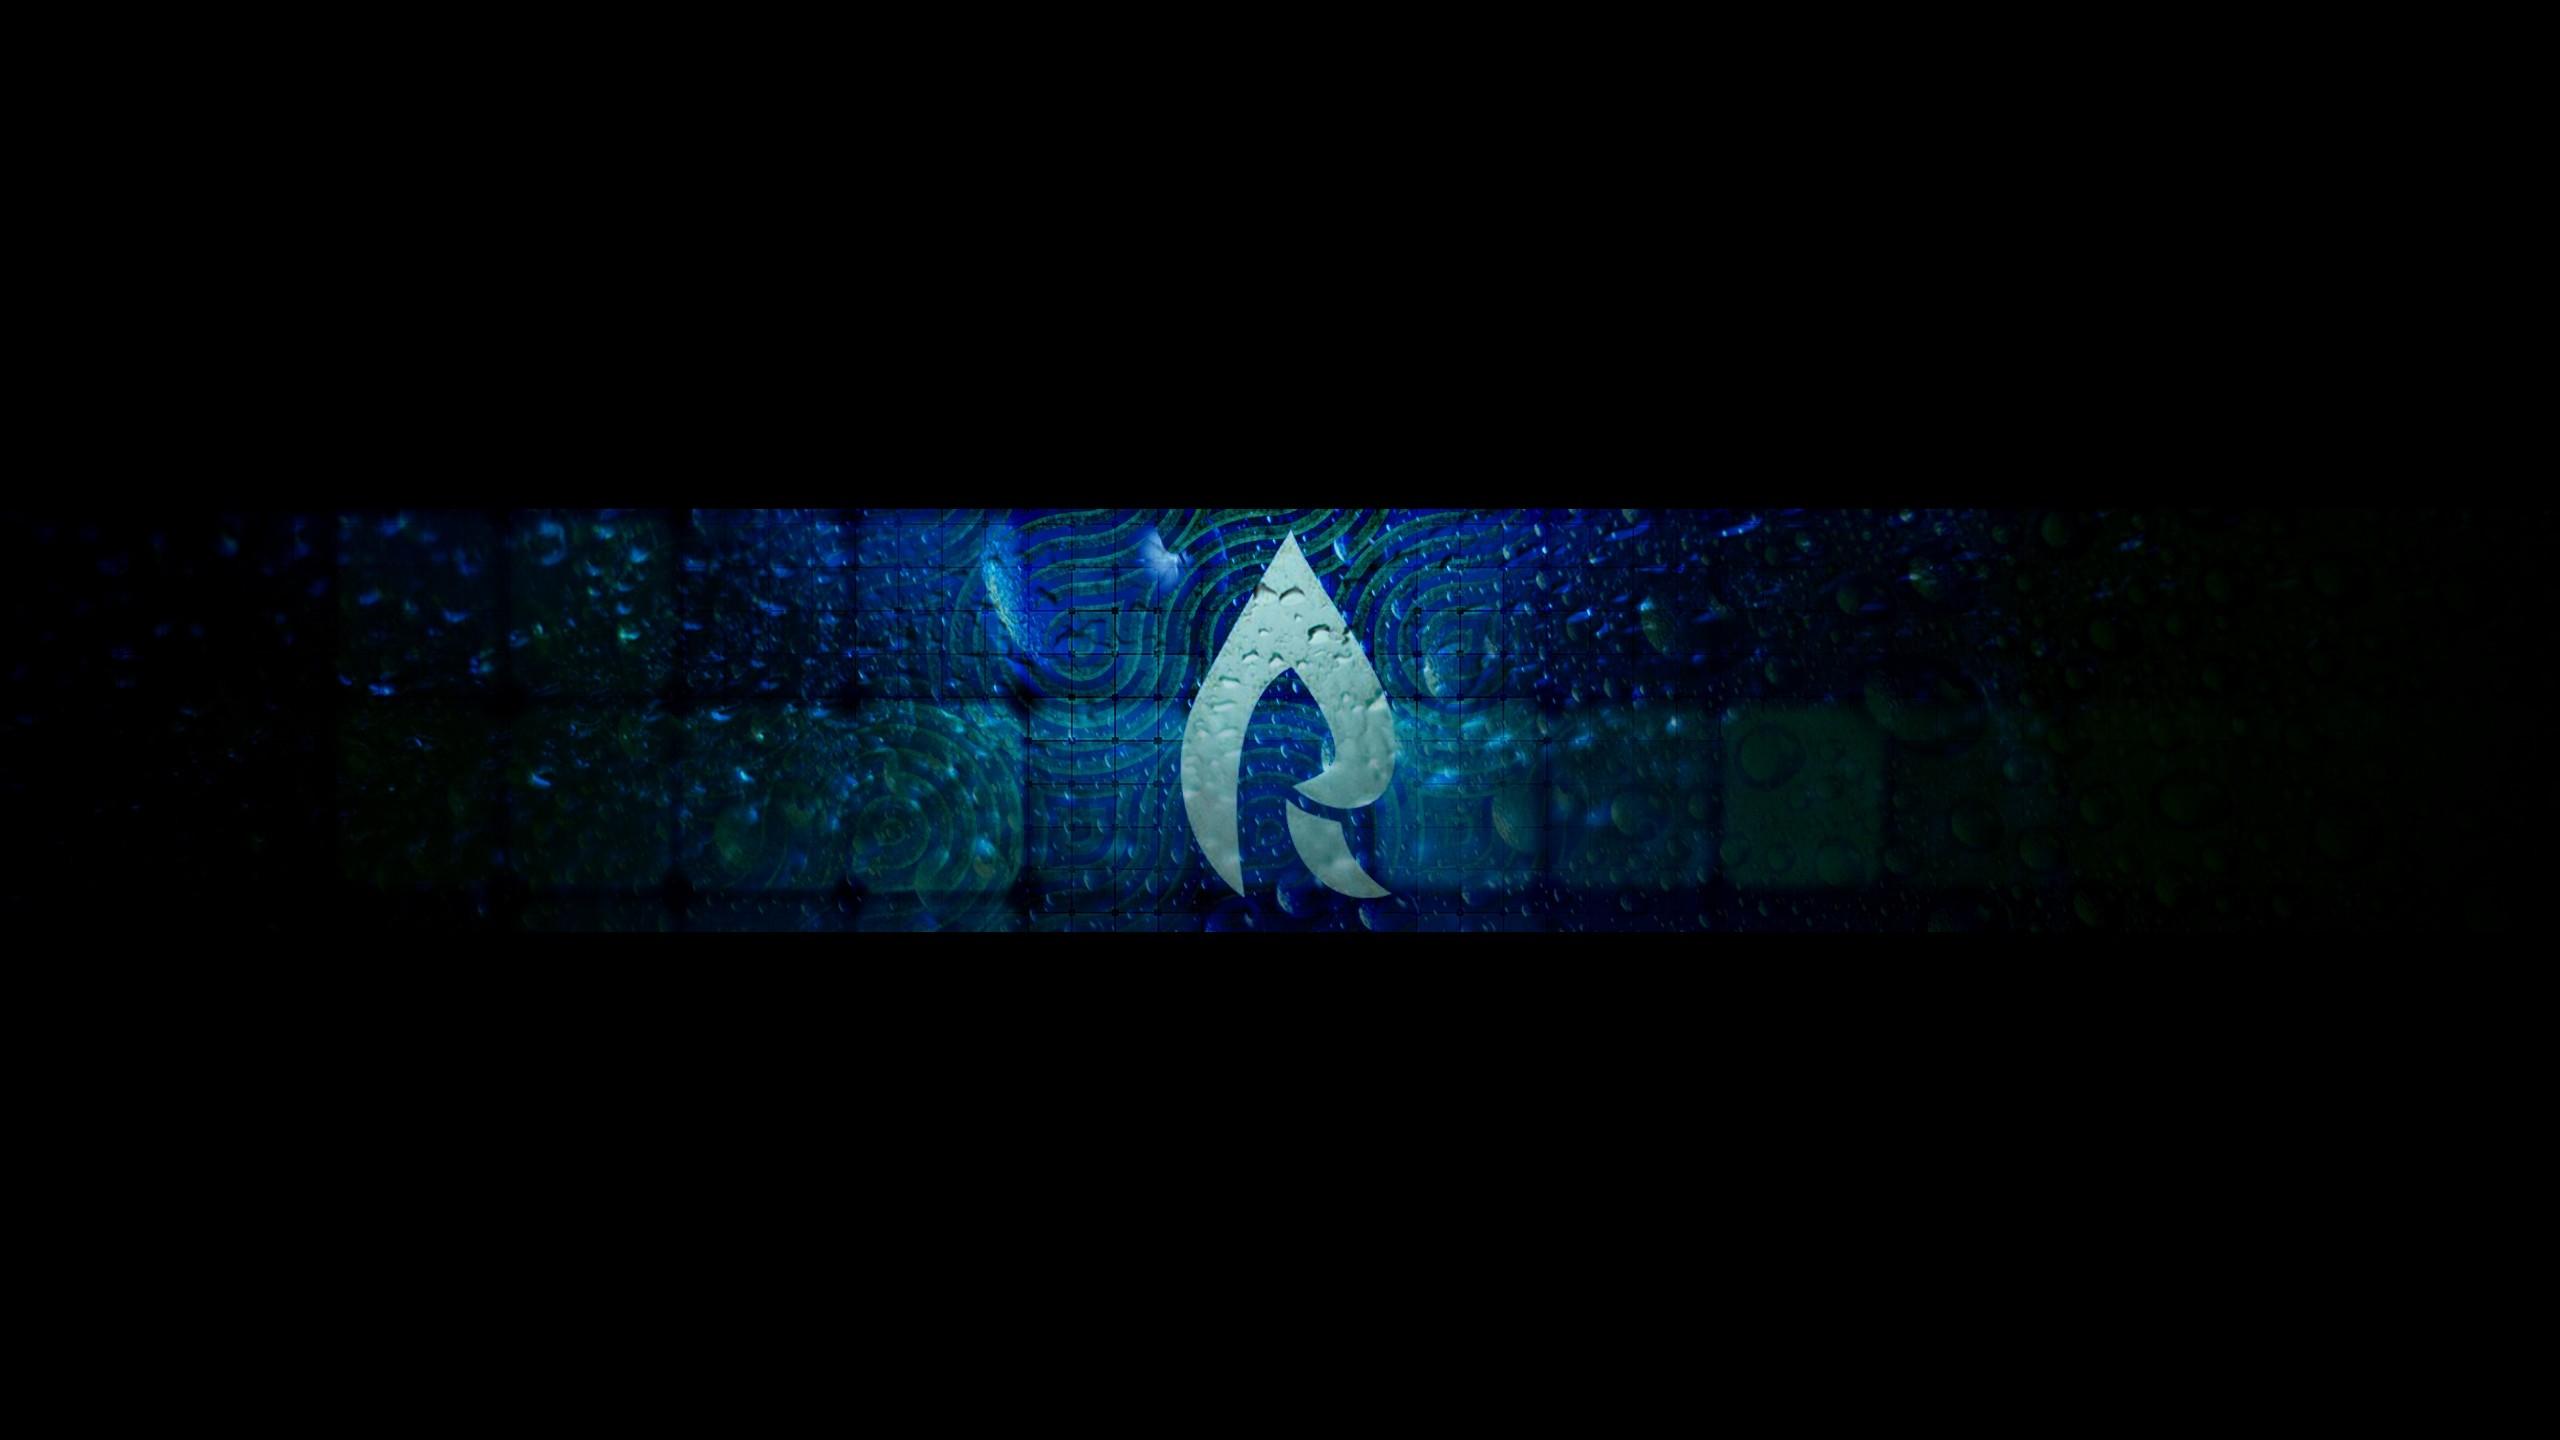 Res: 2560x1440, Faze Rug Logo Inspirational Faze Rain Wallpaper On Markinternationalfo